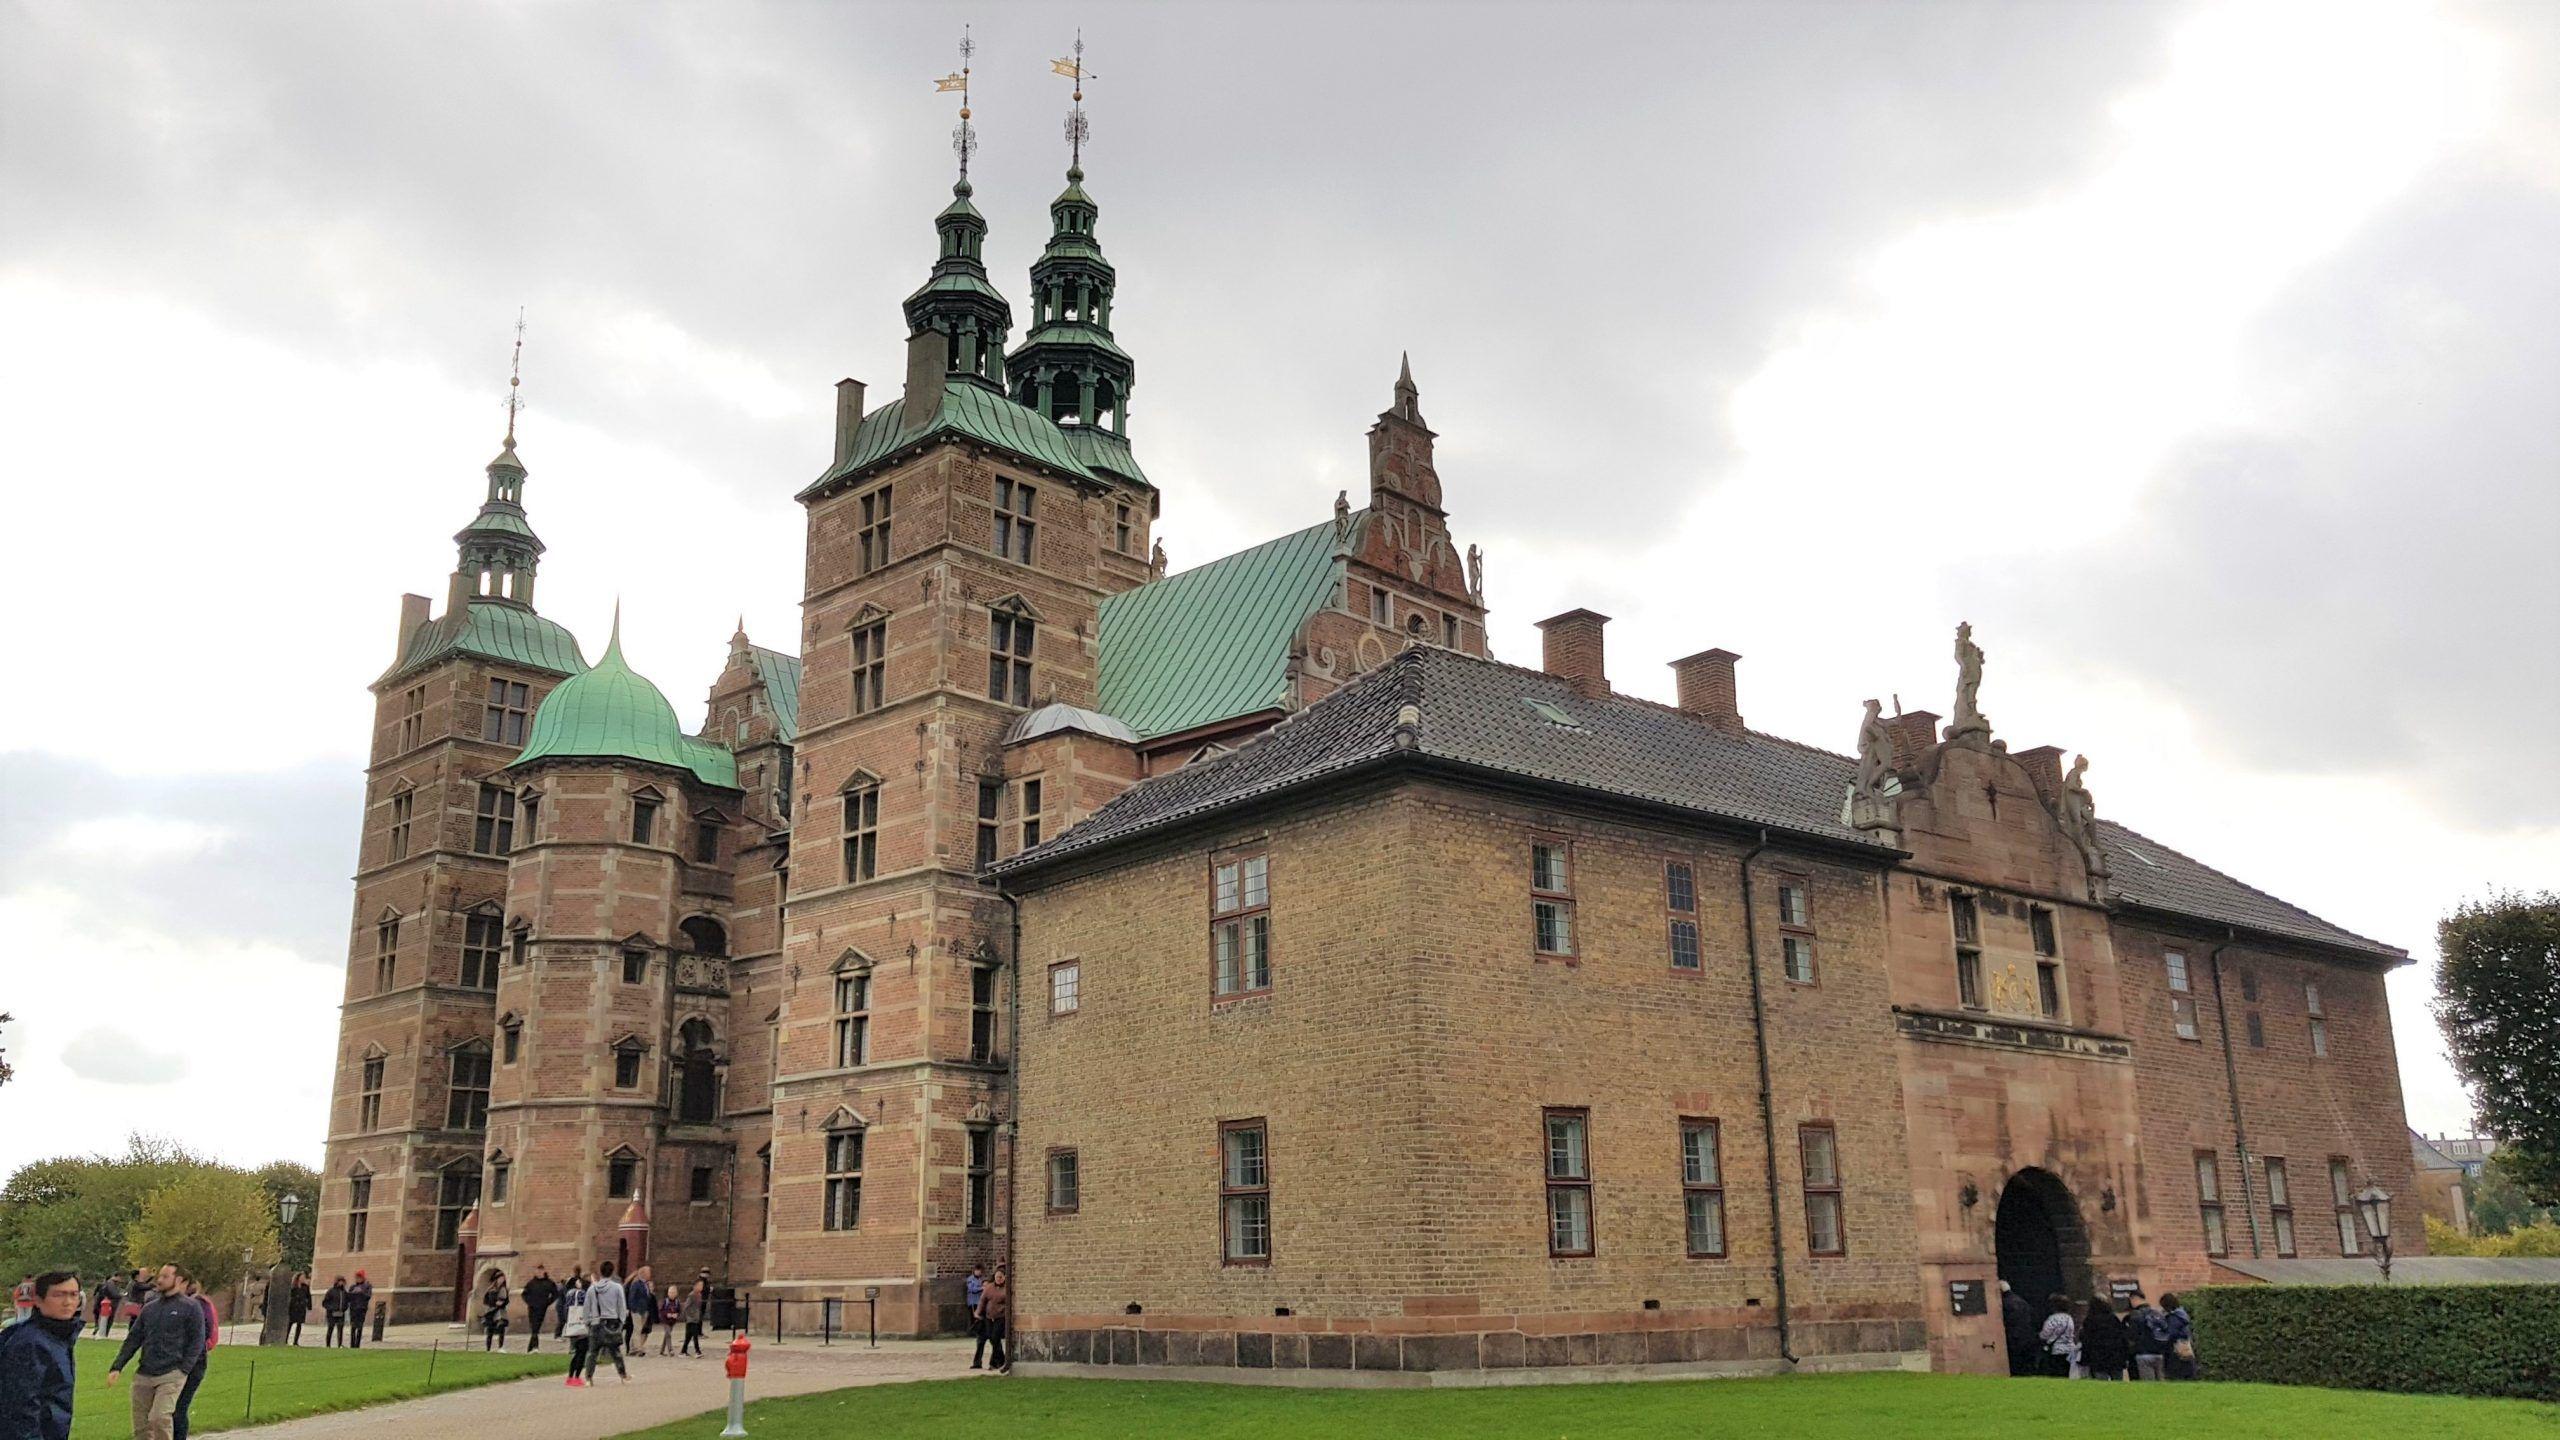 Castillo de Rosenborg rodeado del jardin del rey en Copenhague.